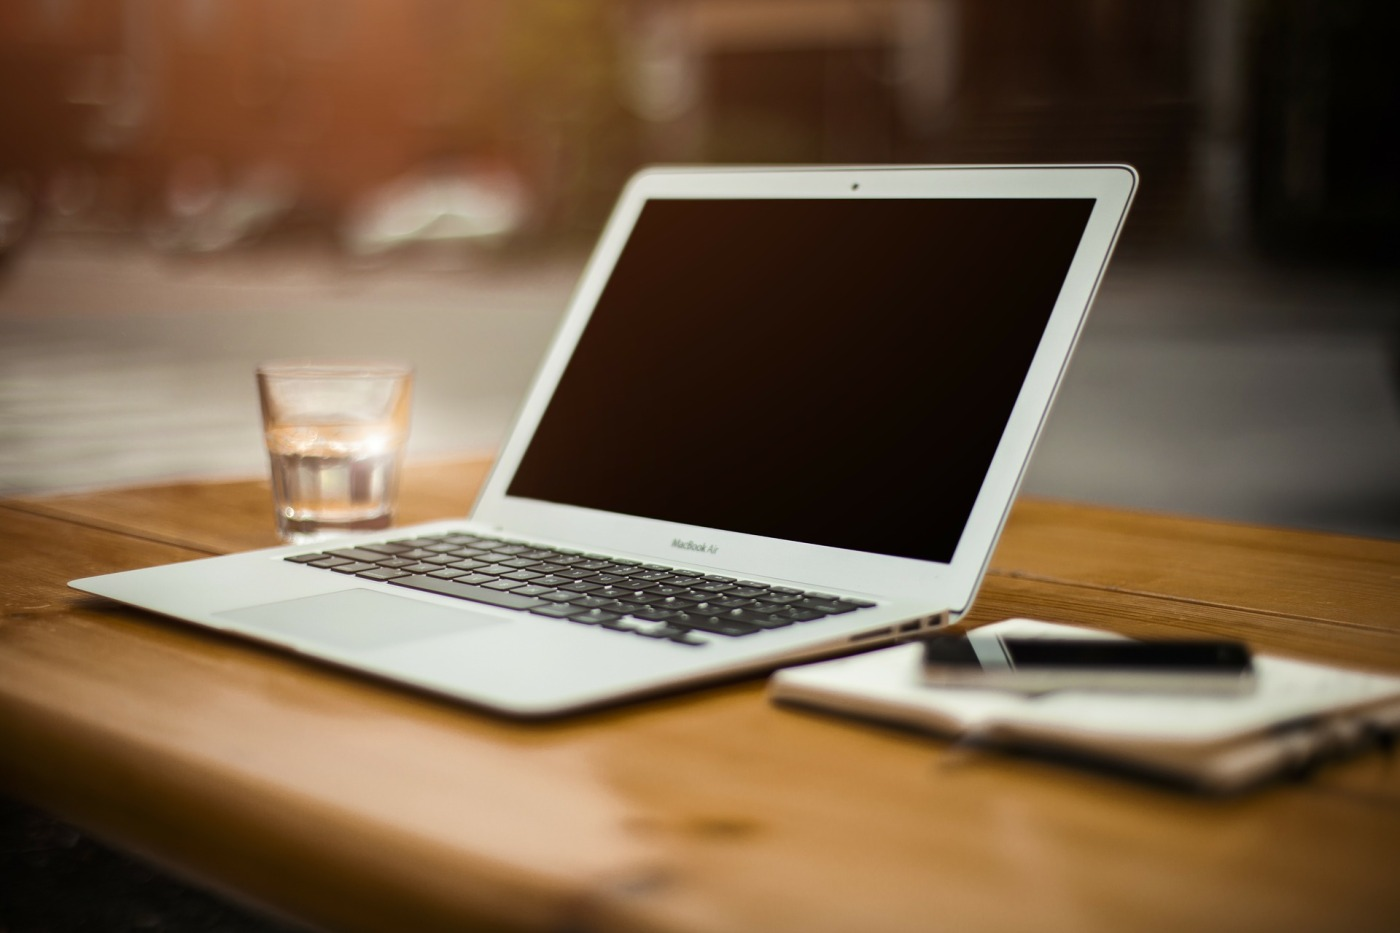 MAC - Apple - Technology - Customer Service - History